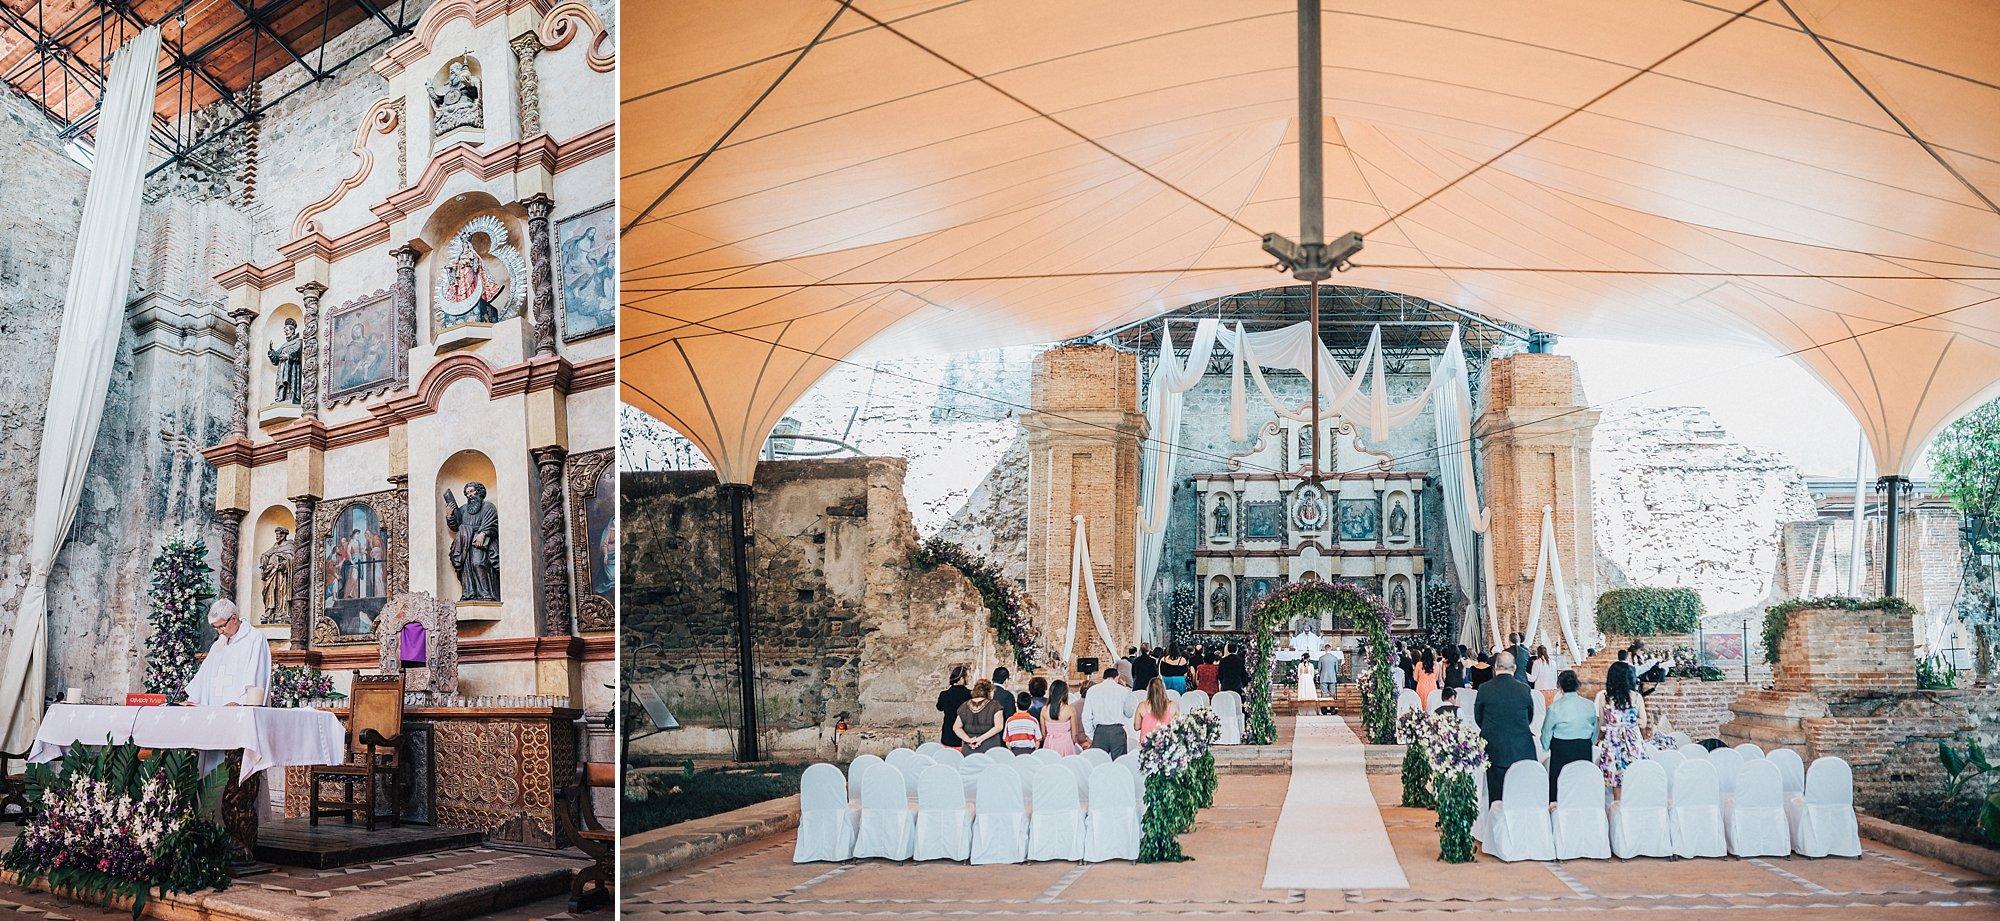 alex-yazmin-wedding-photographer-antigua-guatemala-070